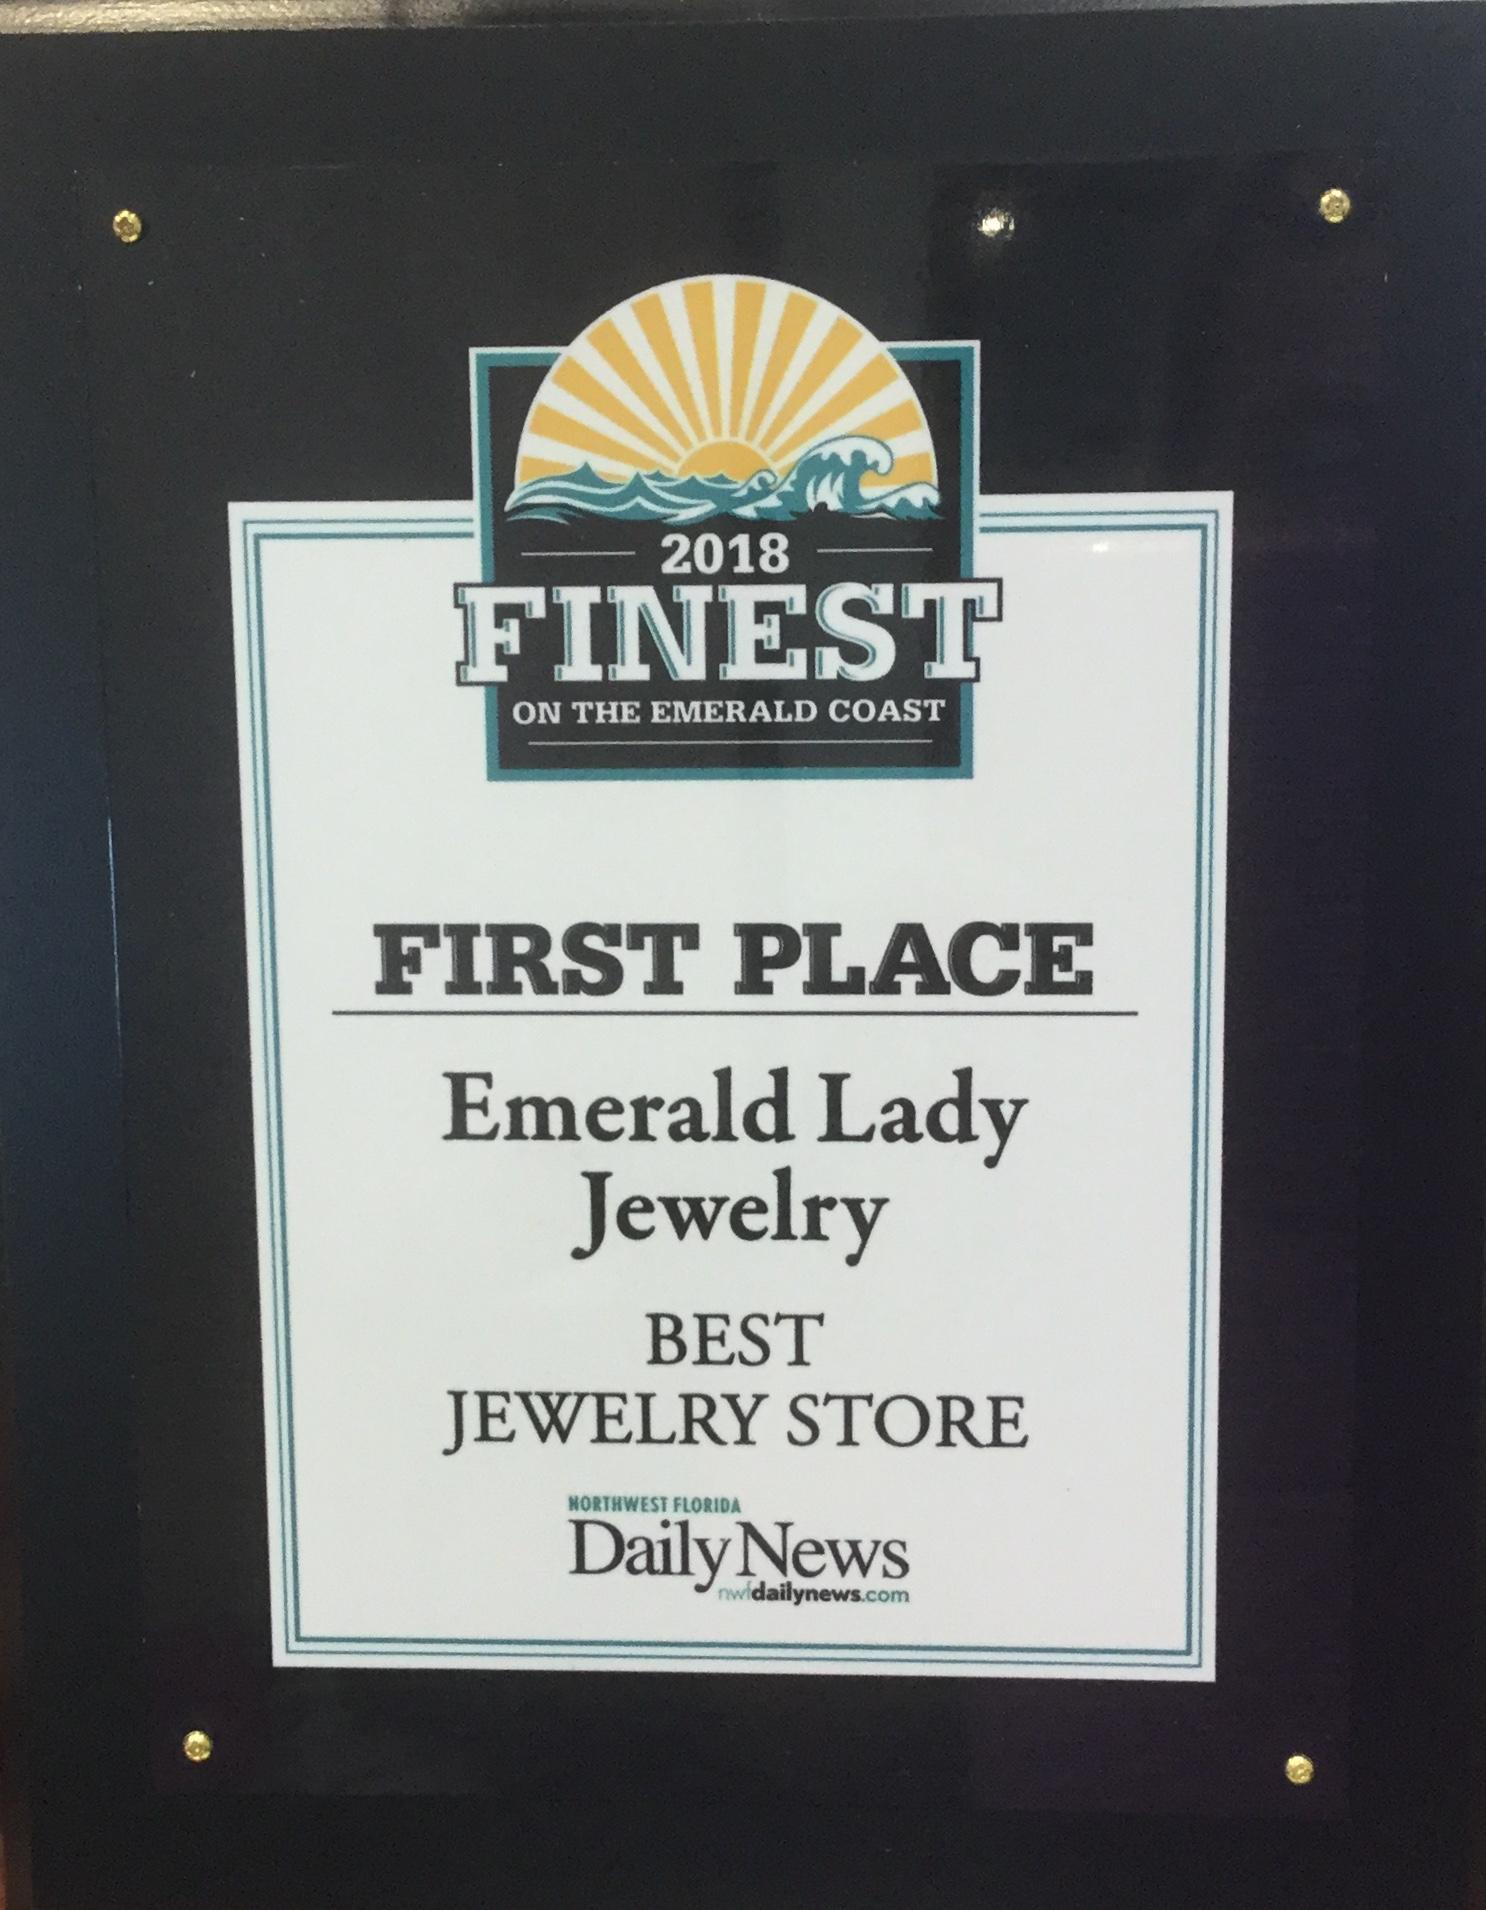 Emerald Lady Jewelry image 99